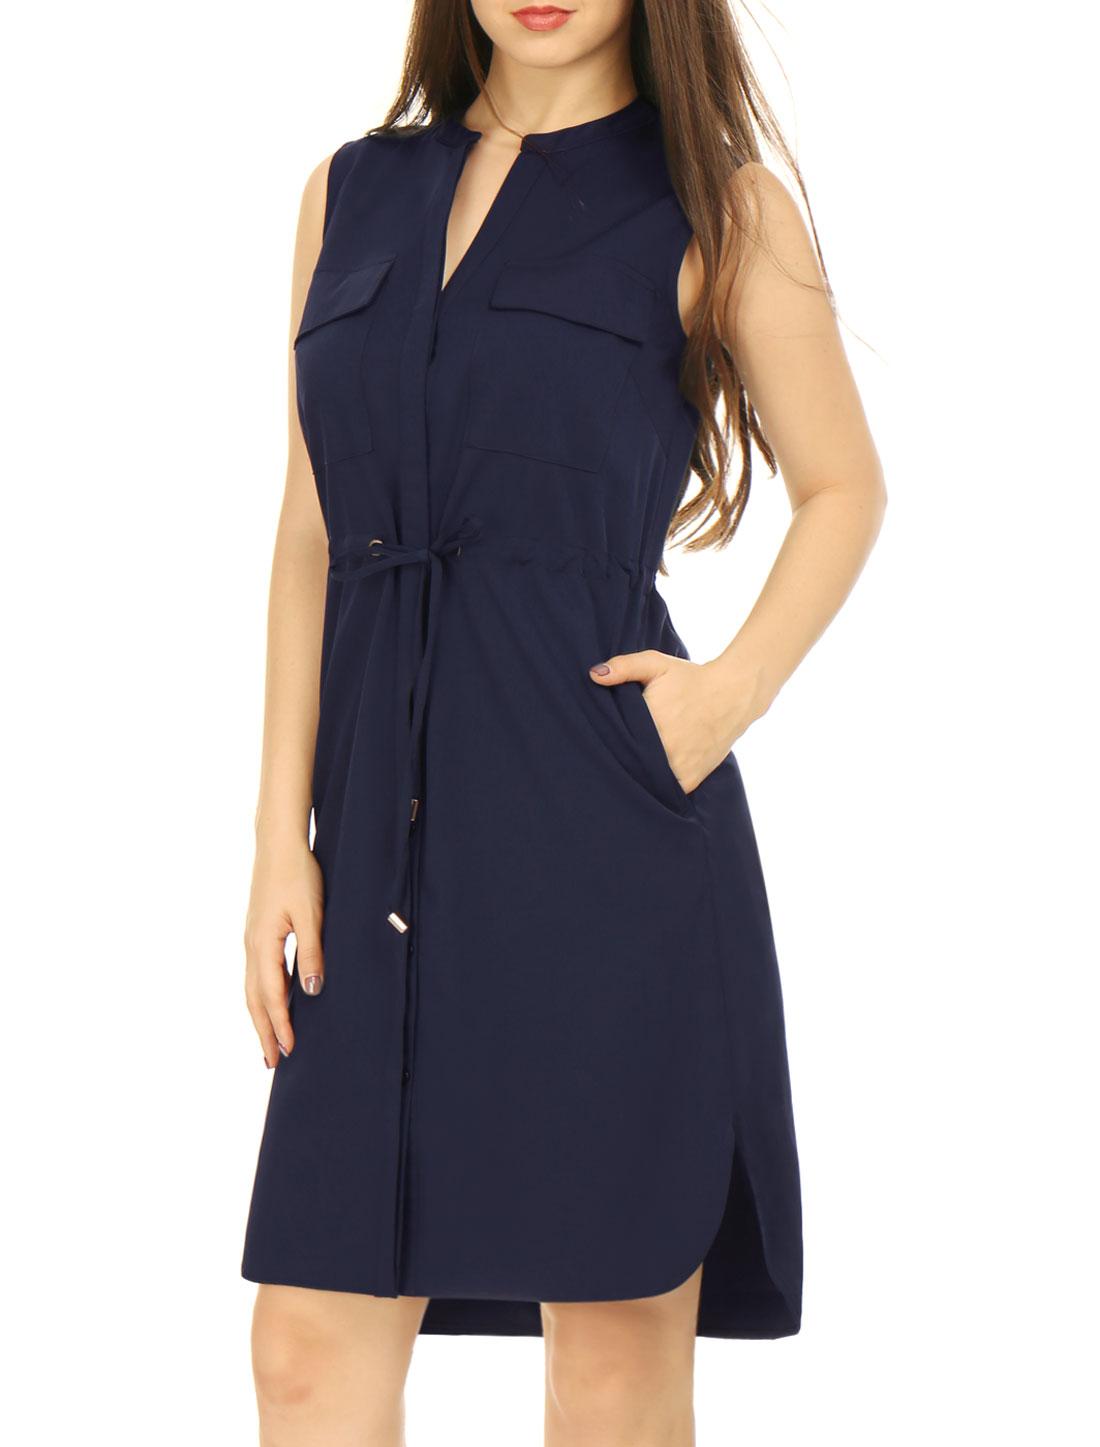 Woman Drawstring Waist Single Breasted Sleeveless Shirt Dress Navy Blue M